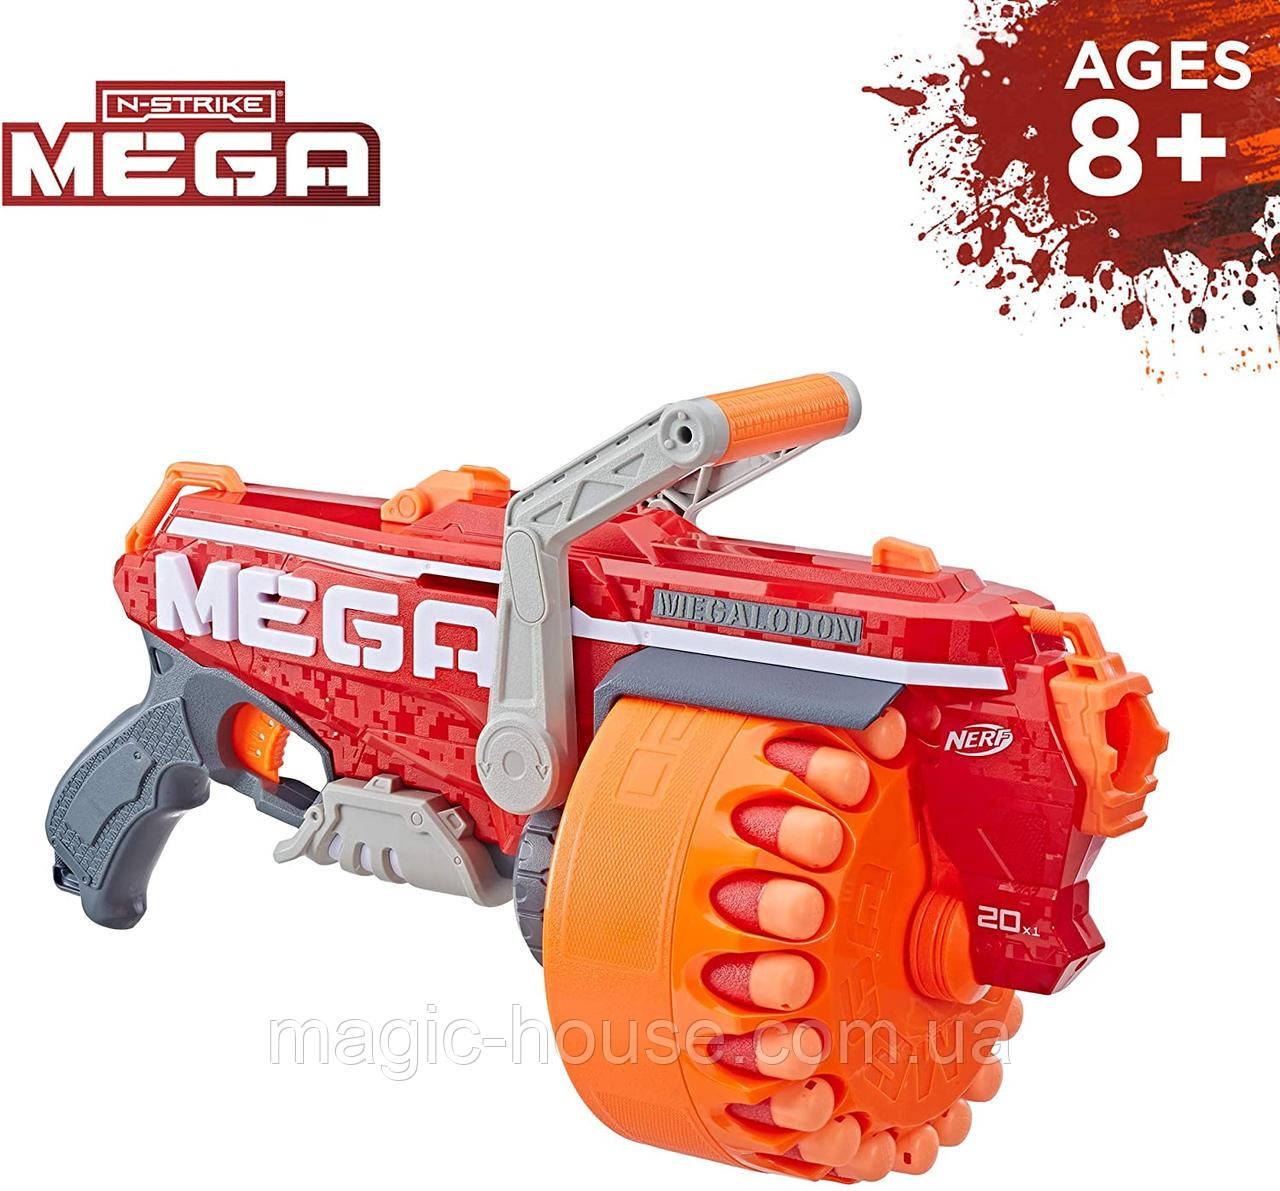 Бластер Нерф Мега Megalodon Nerf N-Strike Mega Оригинал